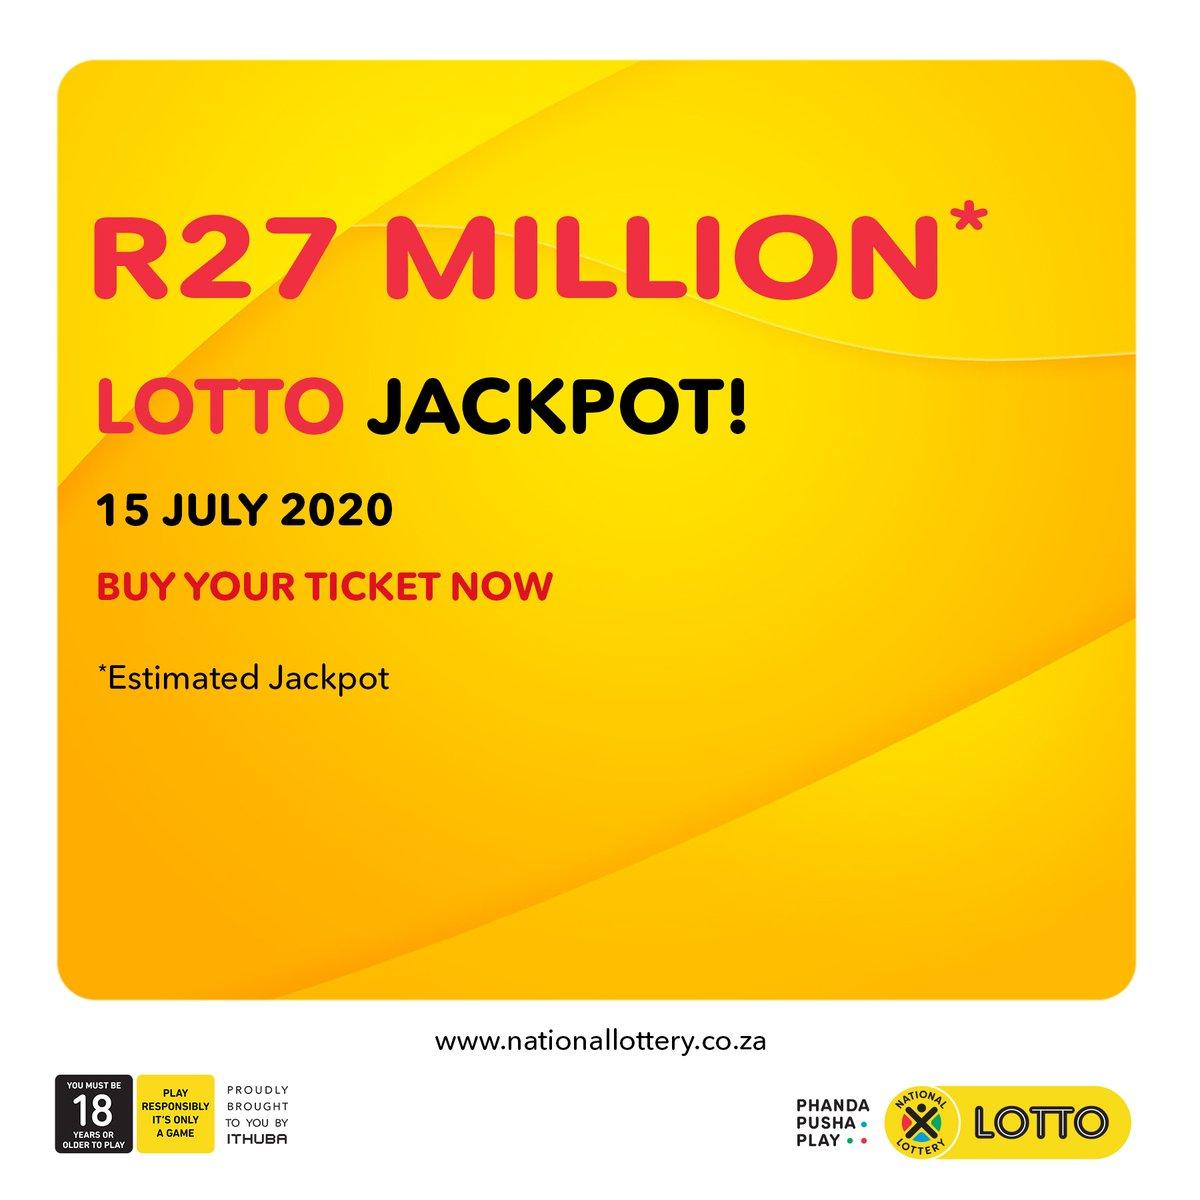 The #LOTTO, #LOTTOPLUS 1 & #LOTTOPLUS 2 estimated jackpots: #LOTTO: R27 Million #LP1: R4 Million #LP2: R11 Million for 15/07/20! #PhandaPushaPlay NOW bit.ly/LottoRegister